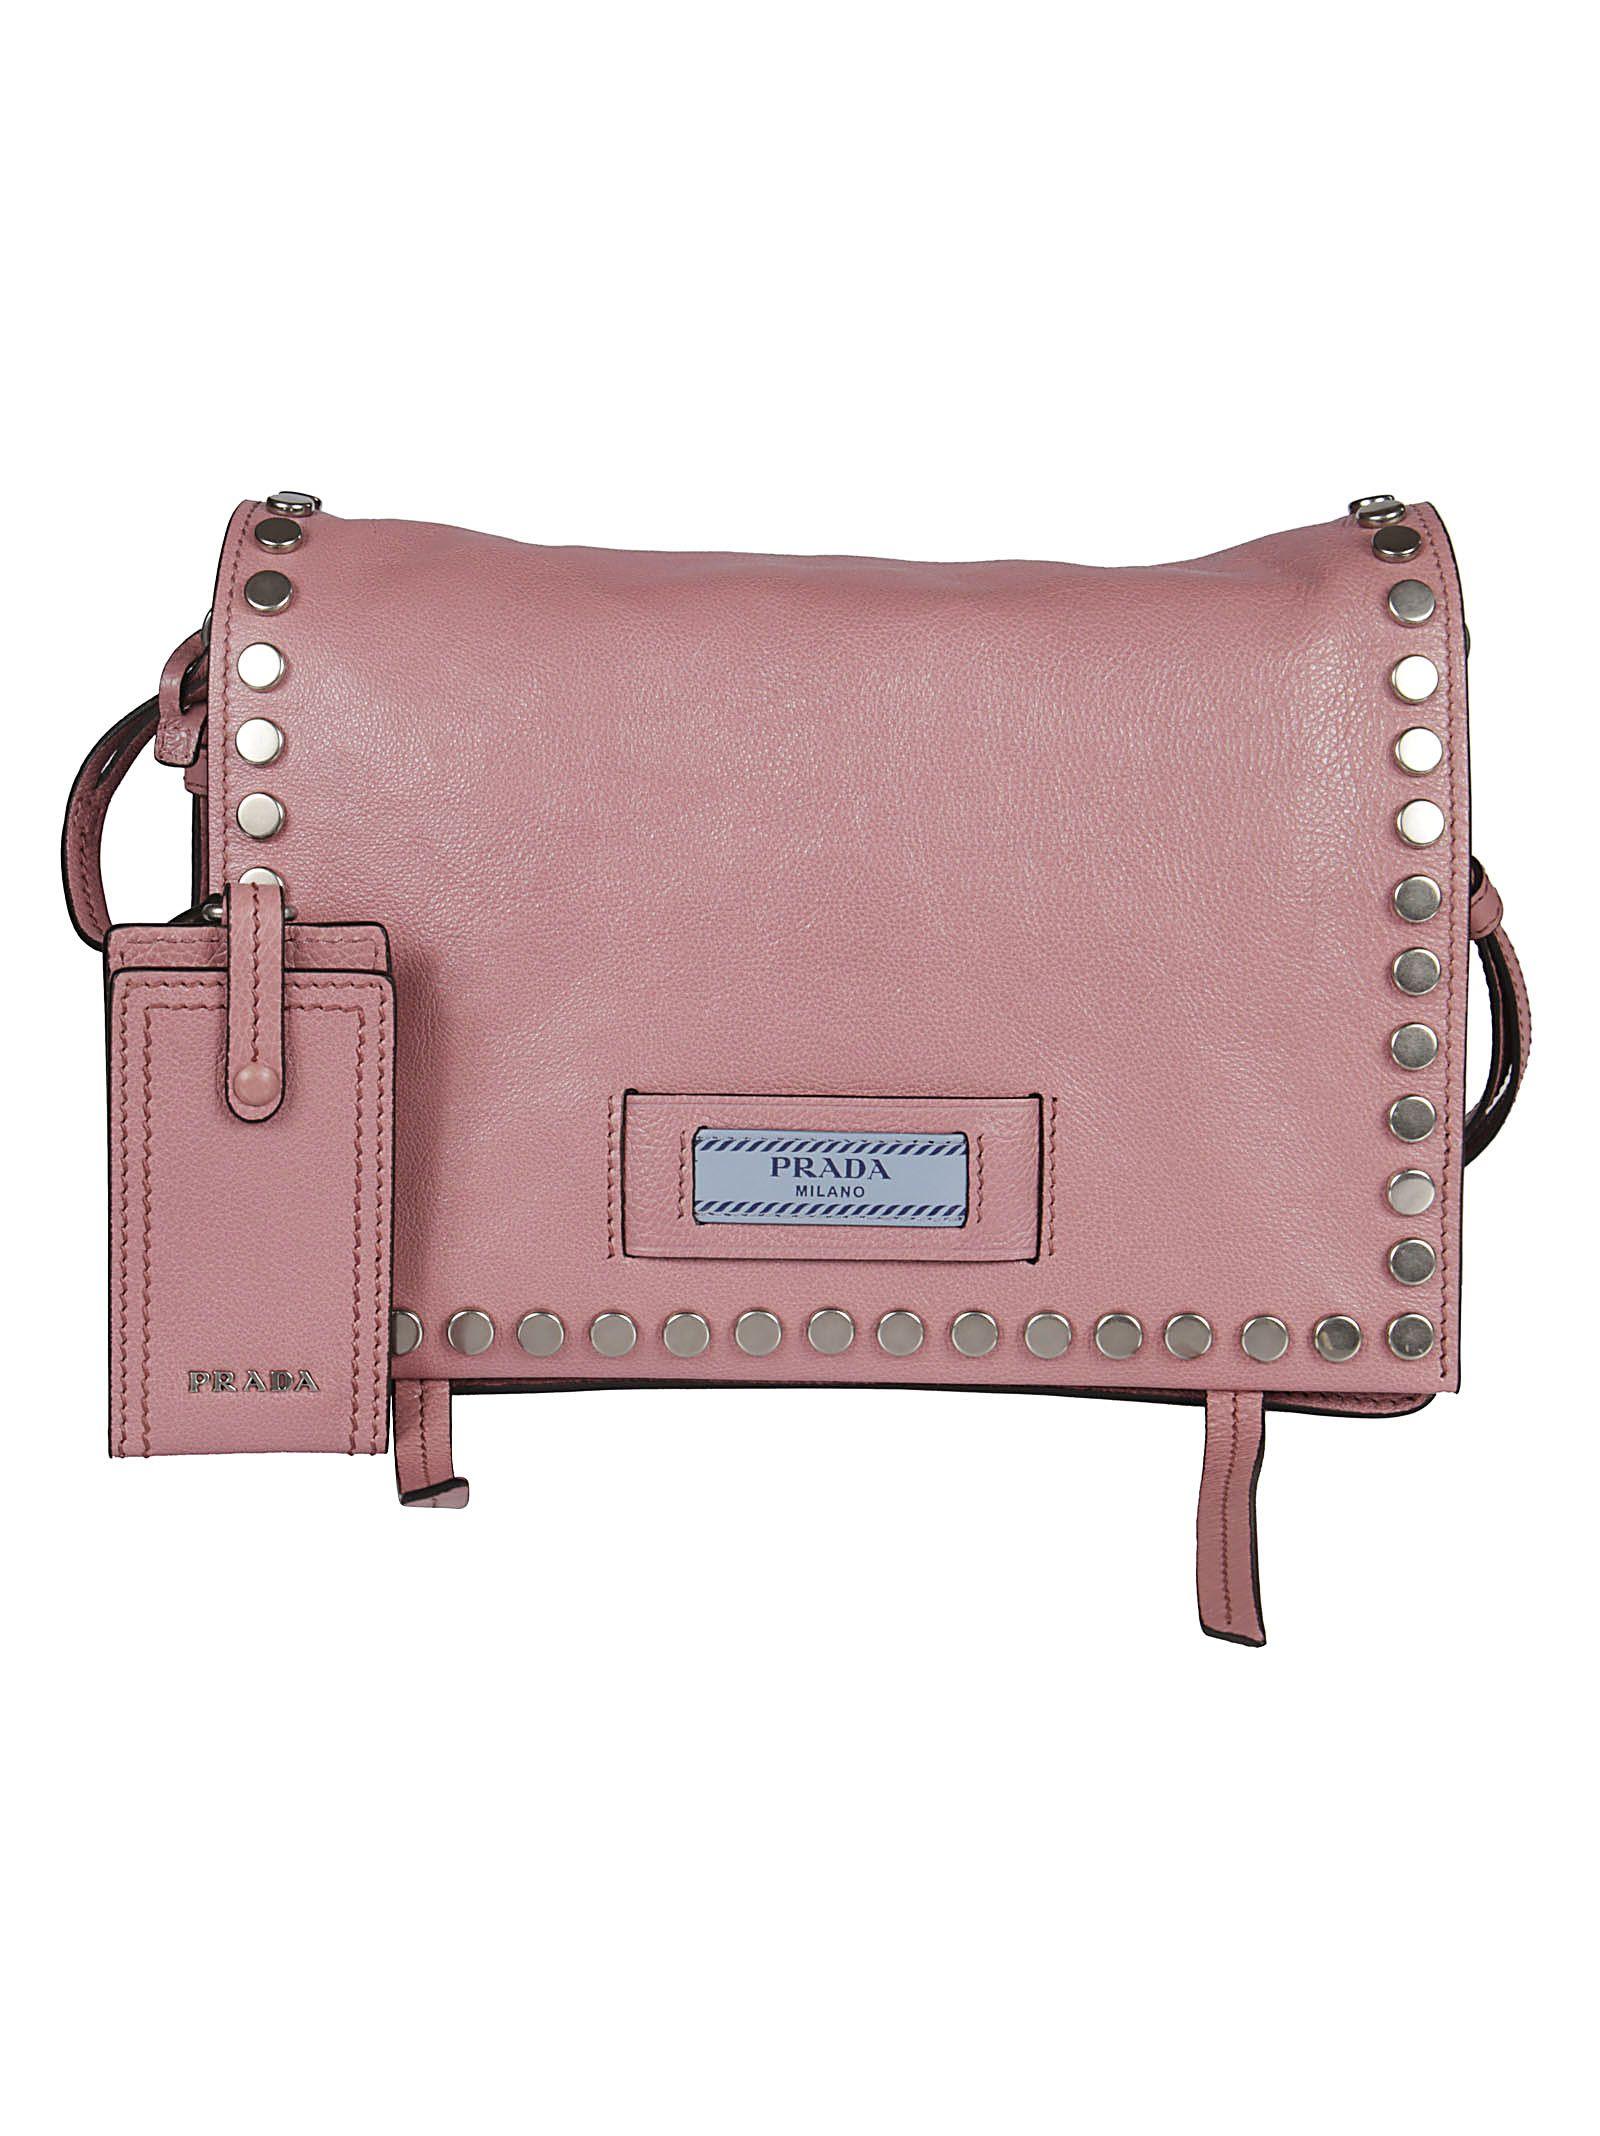 cfa36abc0d27 Prada Etiquette Studded Shoulder Bag In Pink & Purple | ModeSens